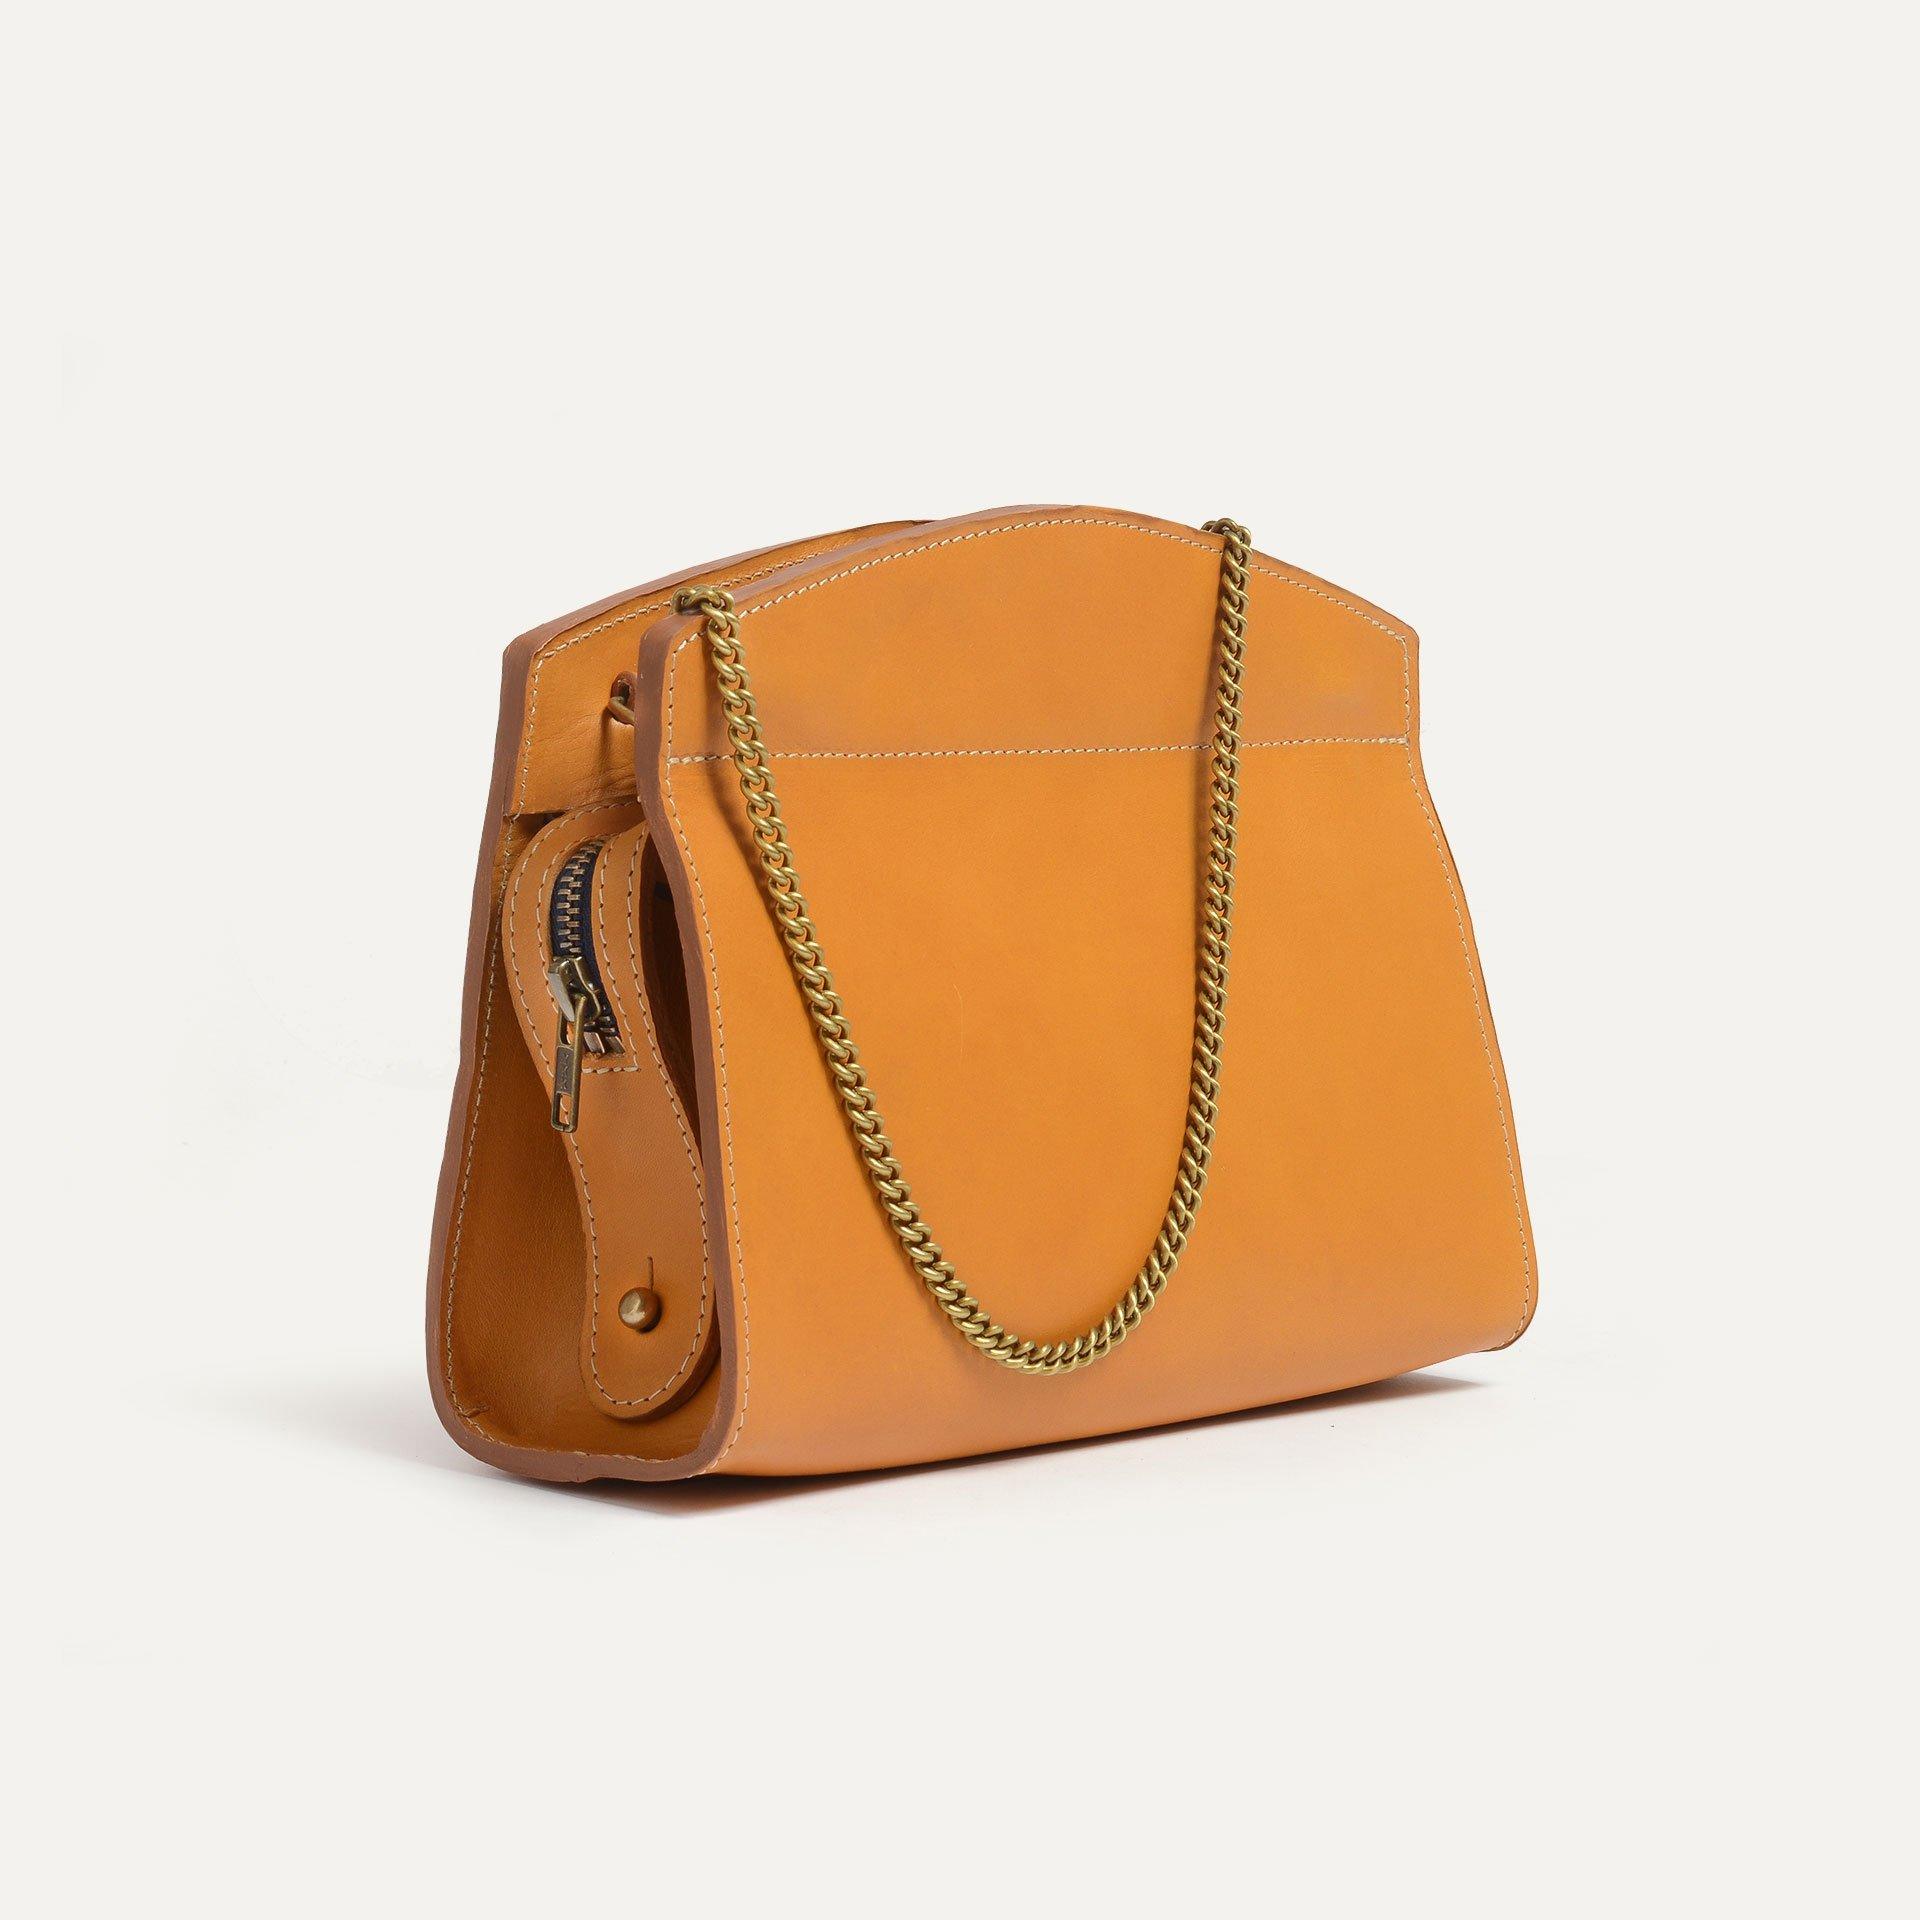 Origami S Zipped clutch bag - Honey (image n°4)